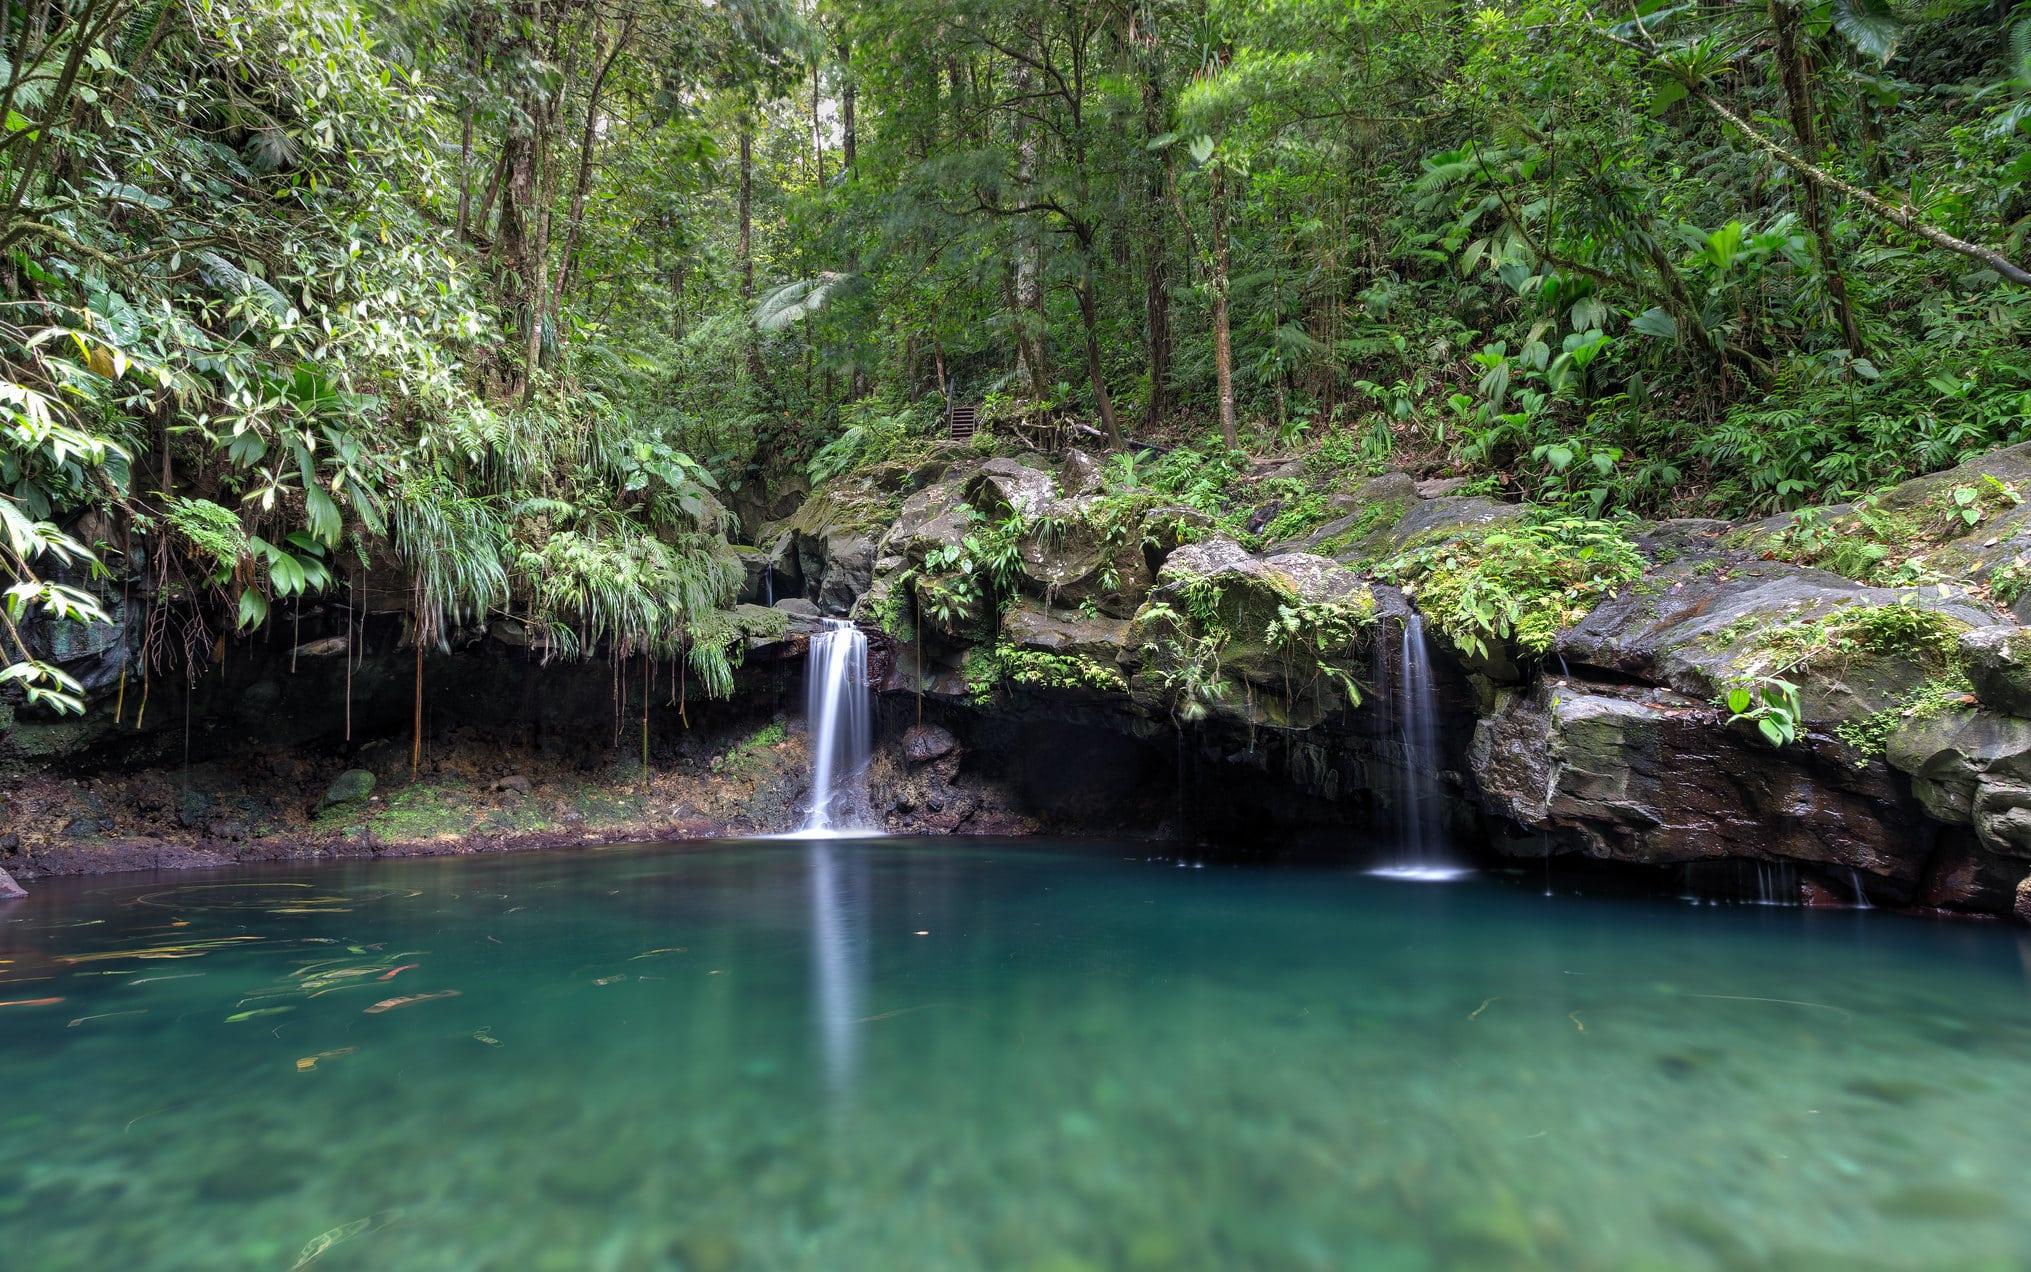 Bassin Paradis - belles cascades de guadeloupe